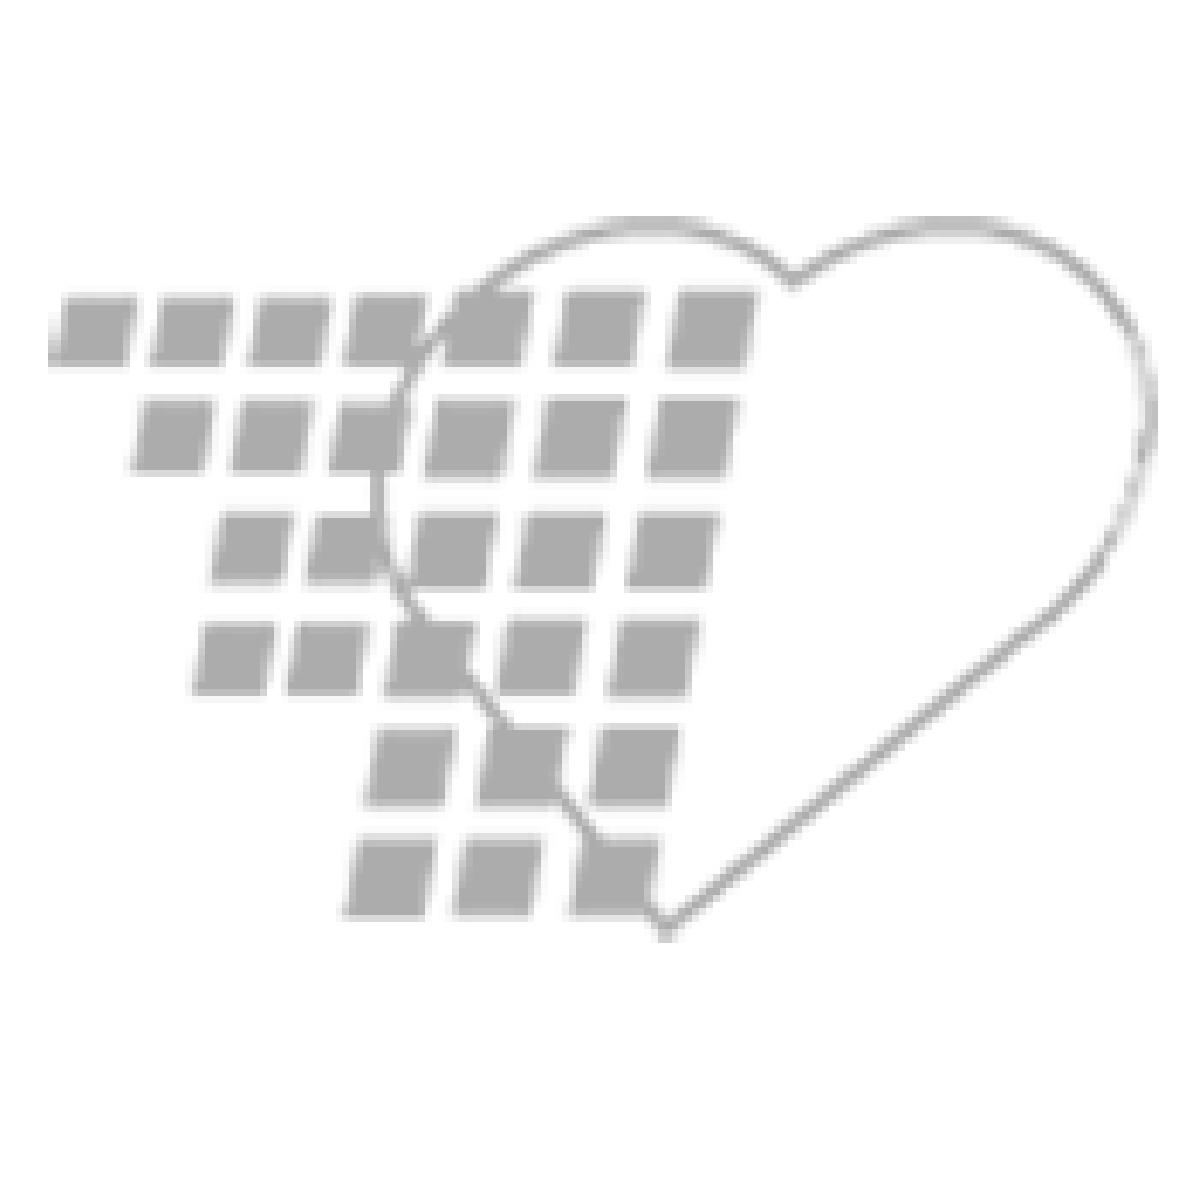 02-44-1090 - Laerdal Standard training pads 1